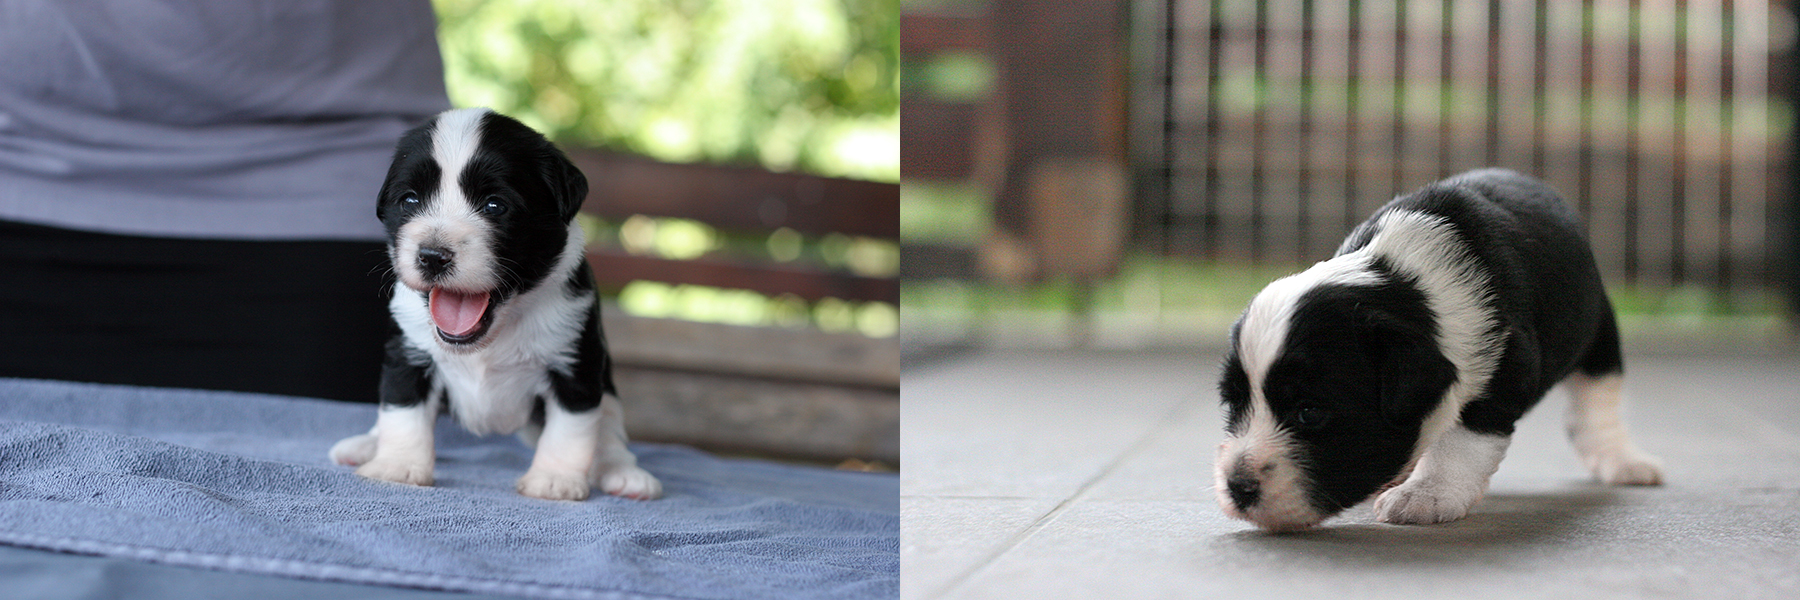 kona24 lhun-po tibetan terriers